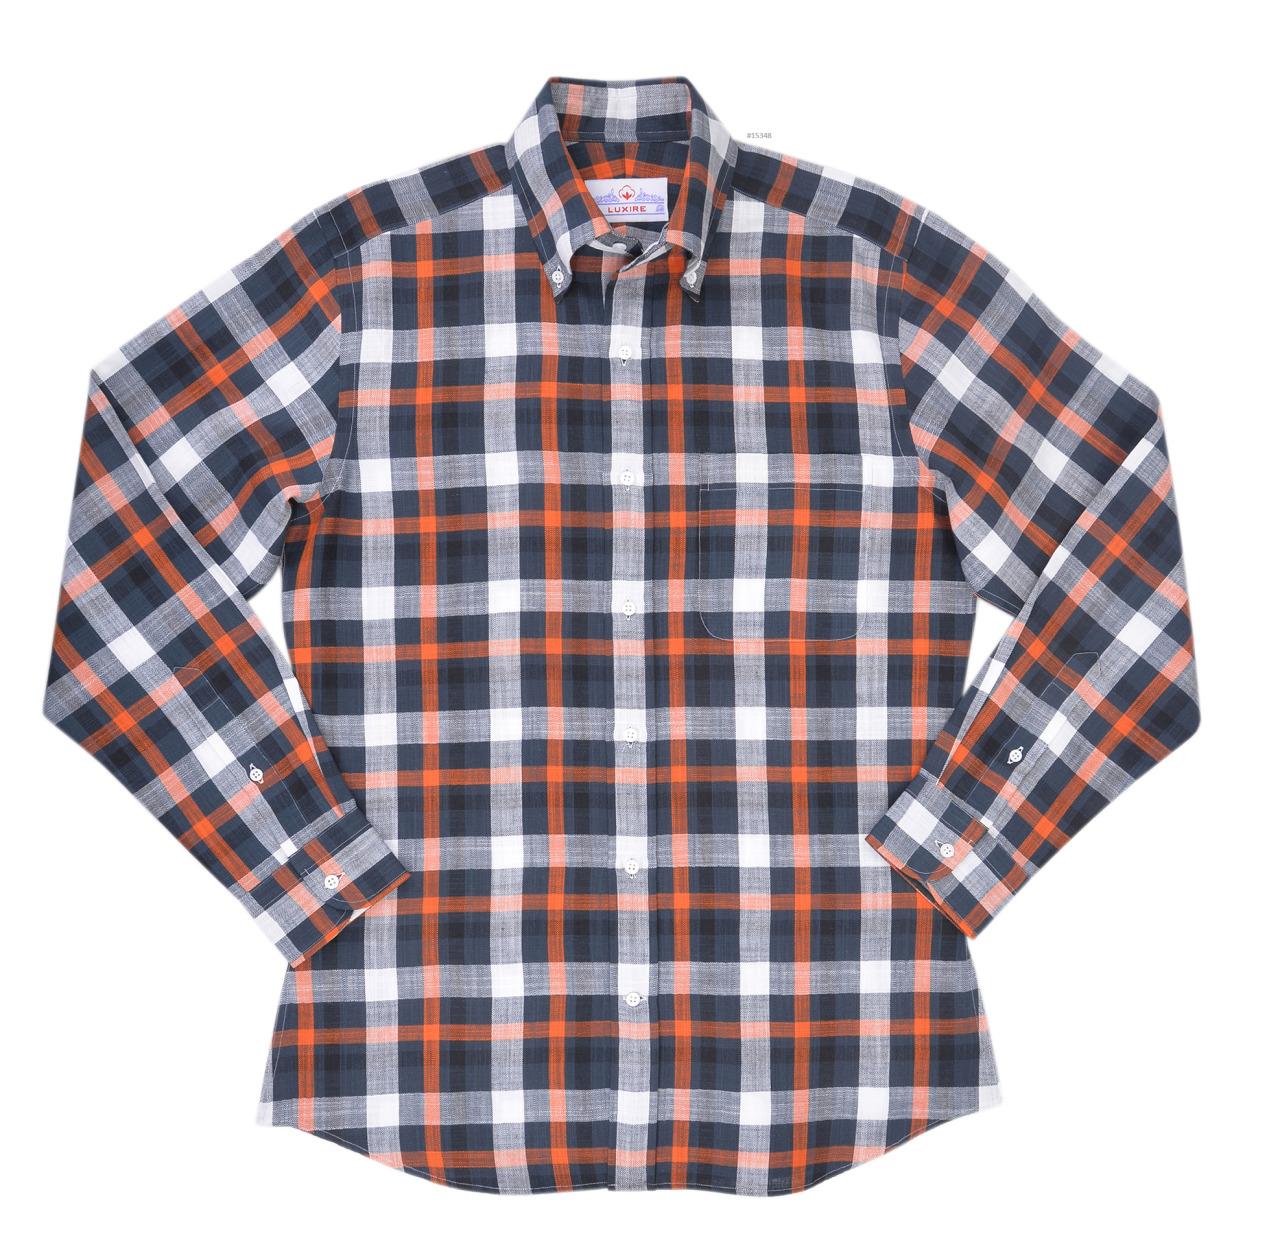 Luxire casual shirt constructed inBlack Orange Checks HerringboneConsists of button down collar and single button barrel cuffs.